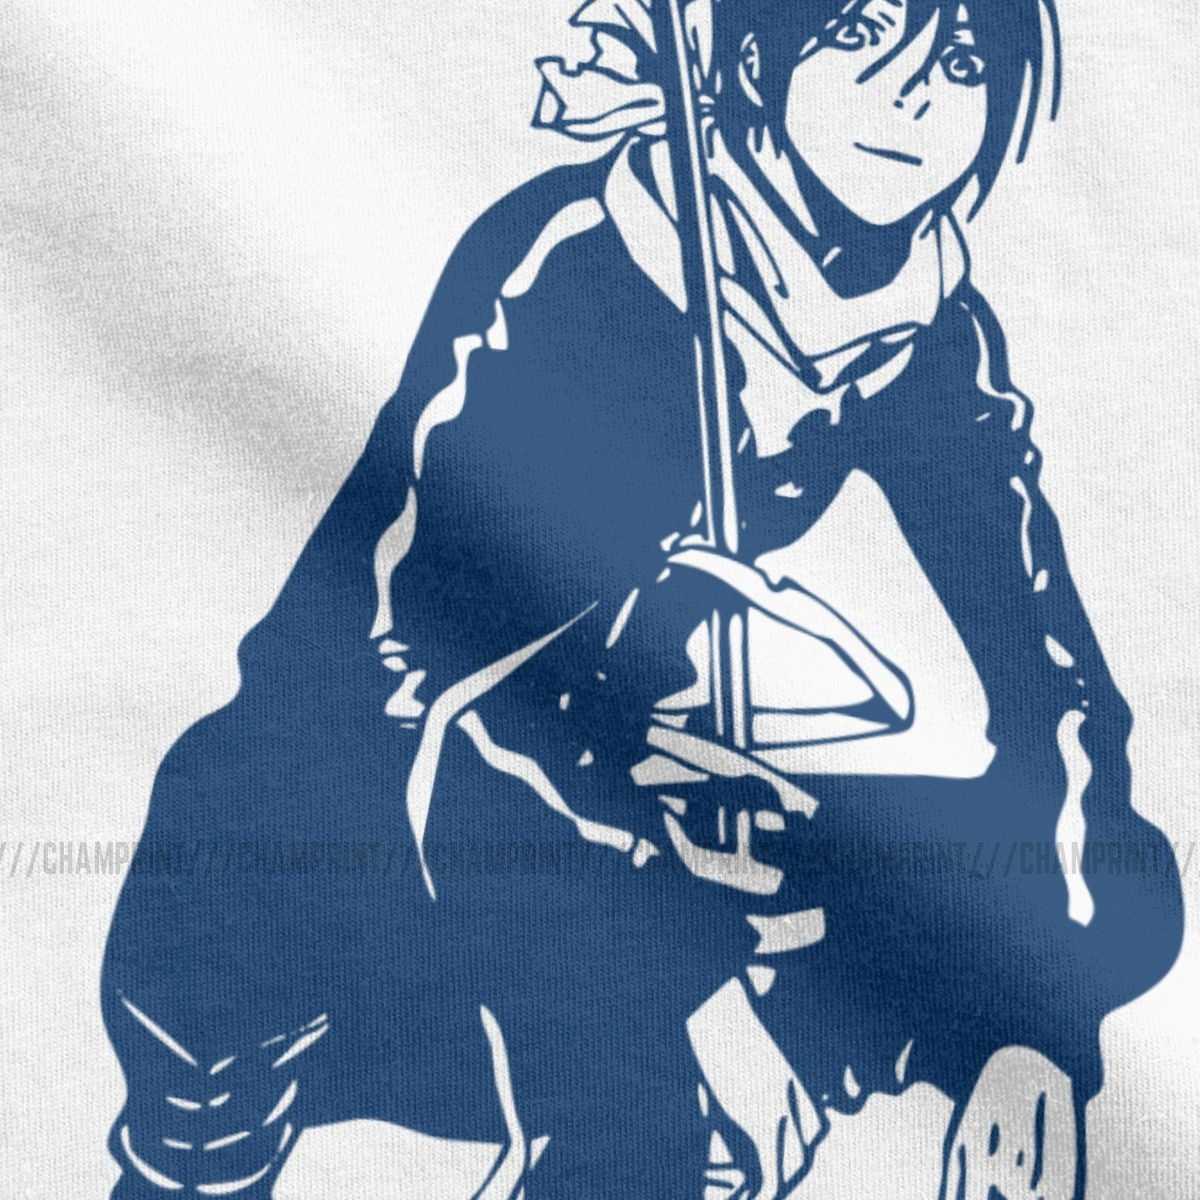 Men Yato Noragami T Shirt Anime Yato Nico Mafumafu Iki Hiyori Yukine God Manga Japan Cotton Short Sleeve Tees Big Size T Shirt Aliexpress